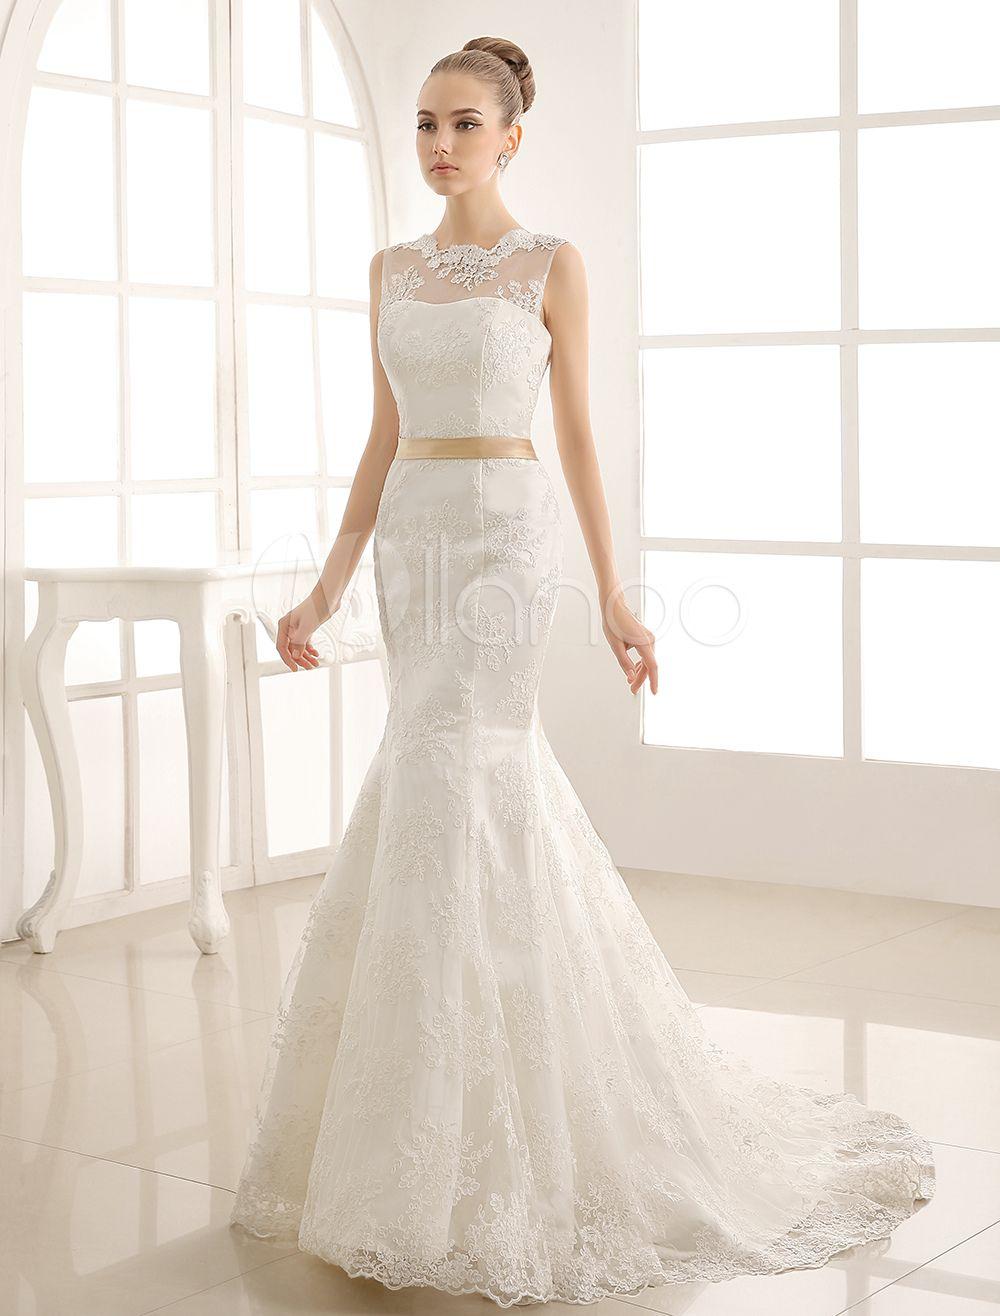 9e8901cfbe2a5 ウェディングドレス マーメイドライン ジュエルネック チャペルトレーン ノースリーブ ...